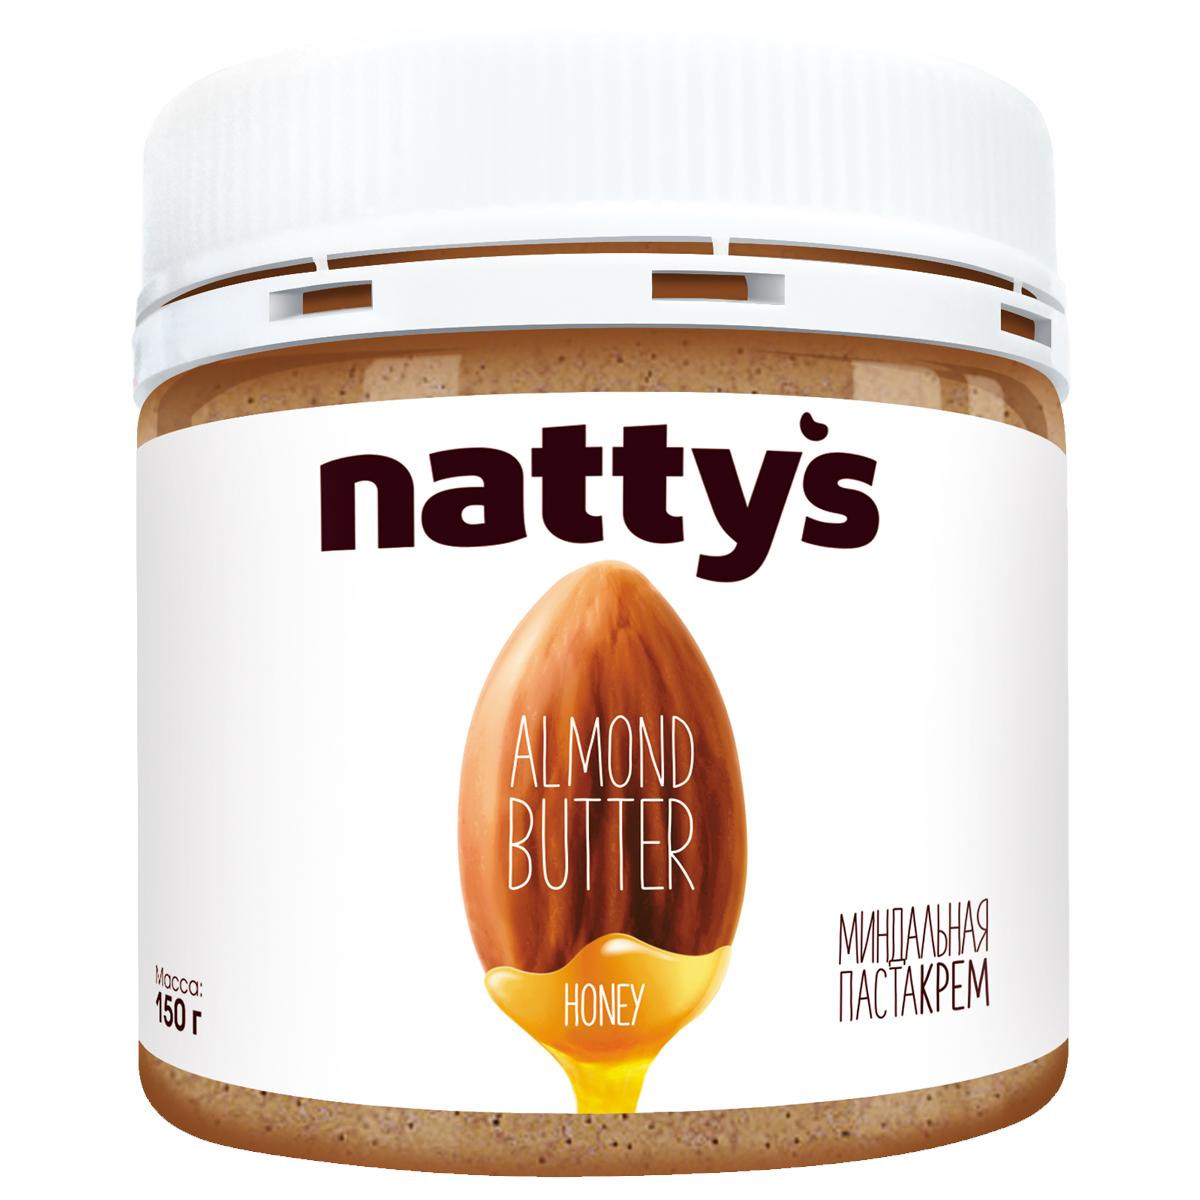 Natty's паста-крем миндальная, 150 г миндальная крошка 150гр